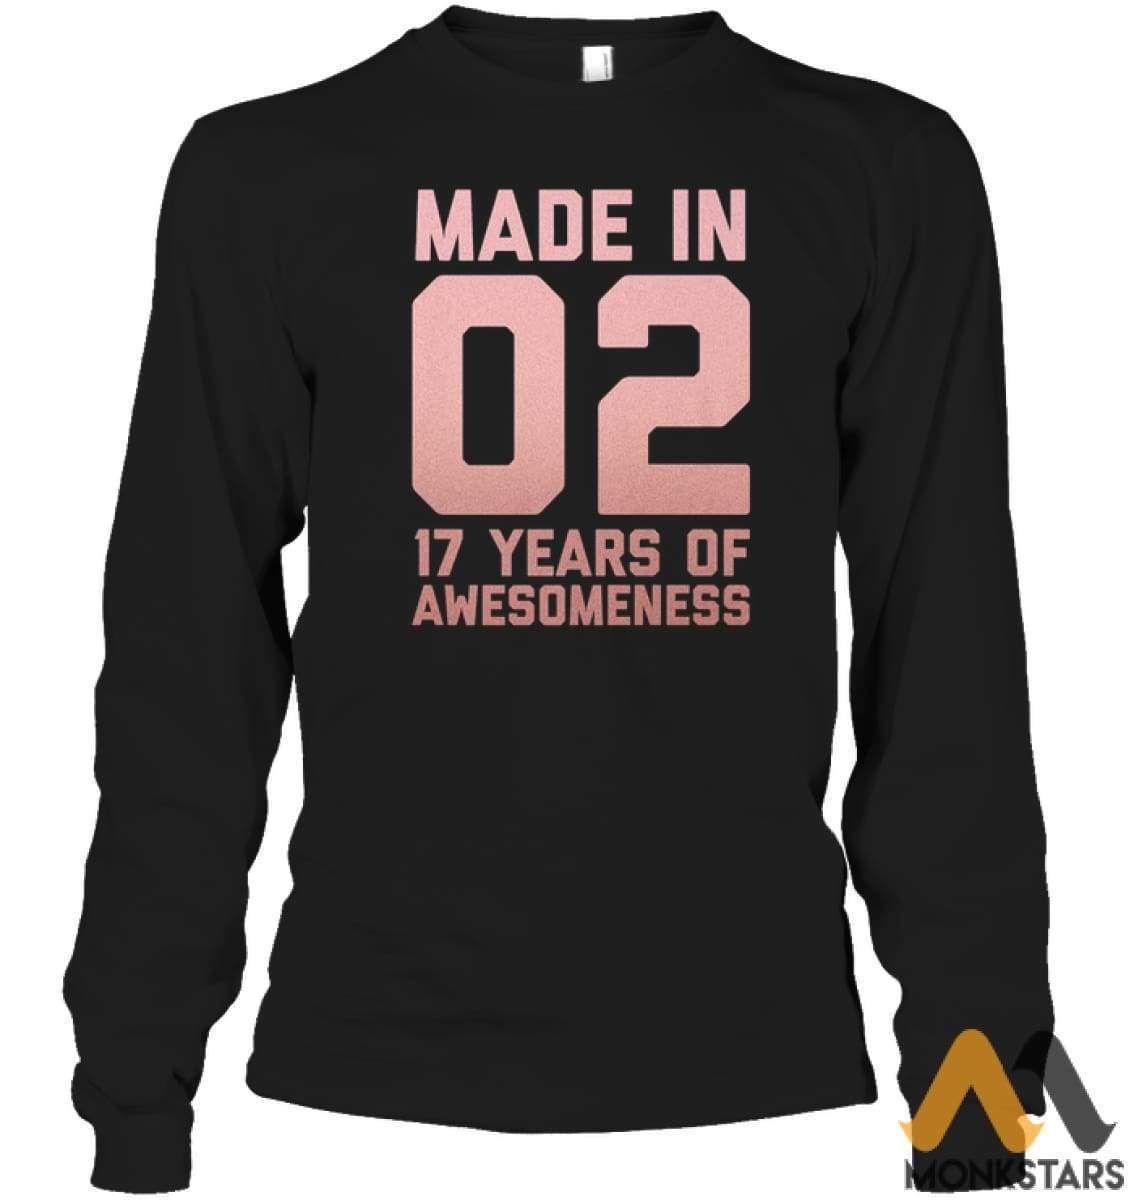 17th Birthday Shirt Teen Girls Age 17 Year Old Niece Gifts - Monkstars Inc. #17thbirthday